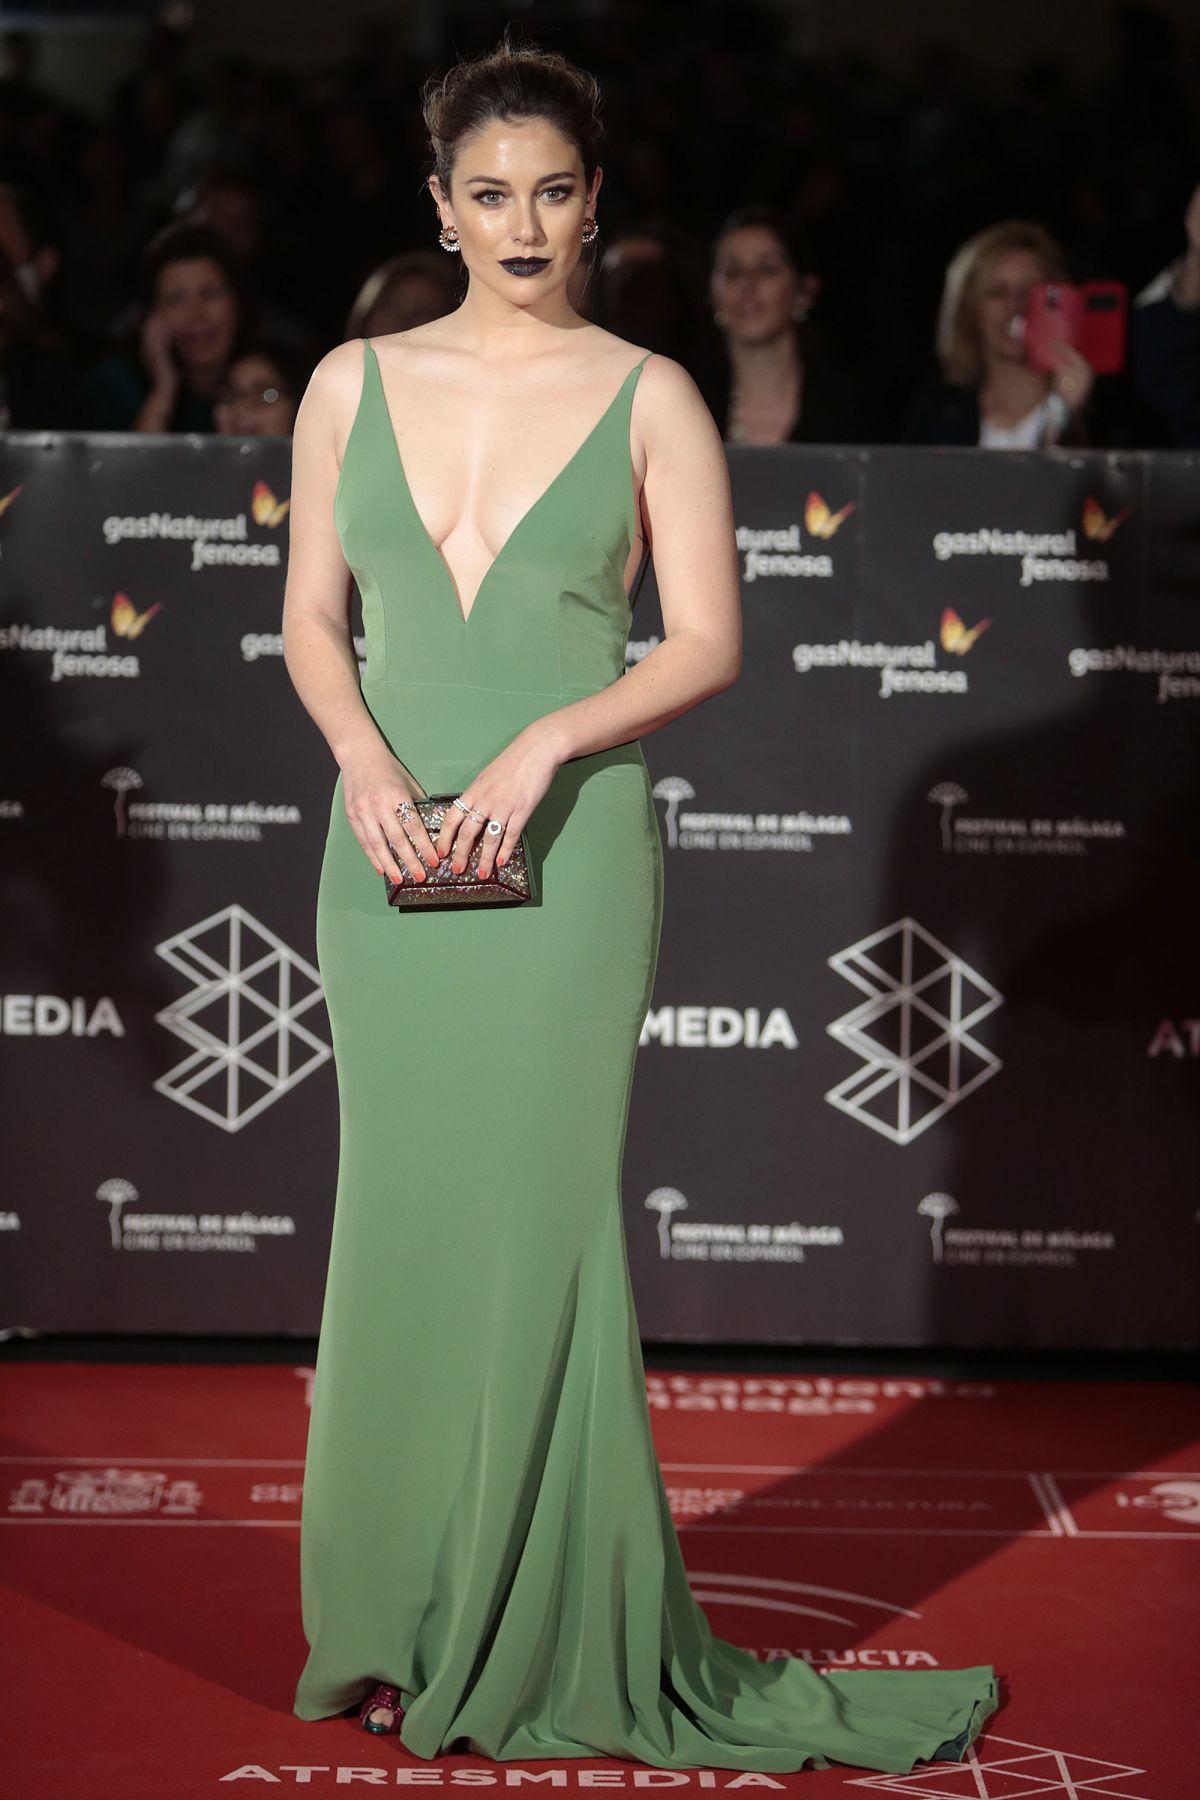 BLANCA SUAREZ at 20th Malaga Film Festival Opening Ceremony in Malaga 03/17/2017